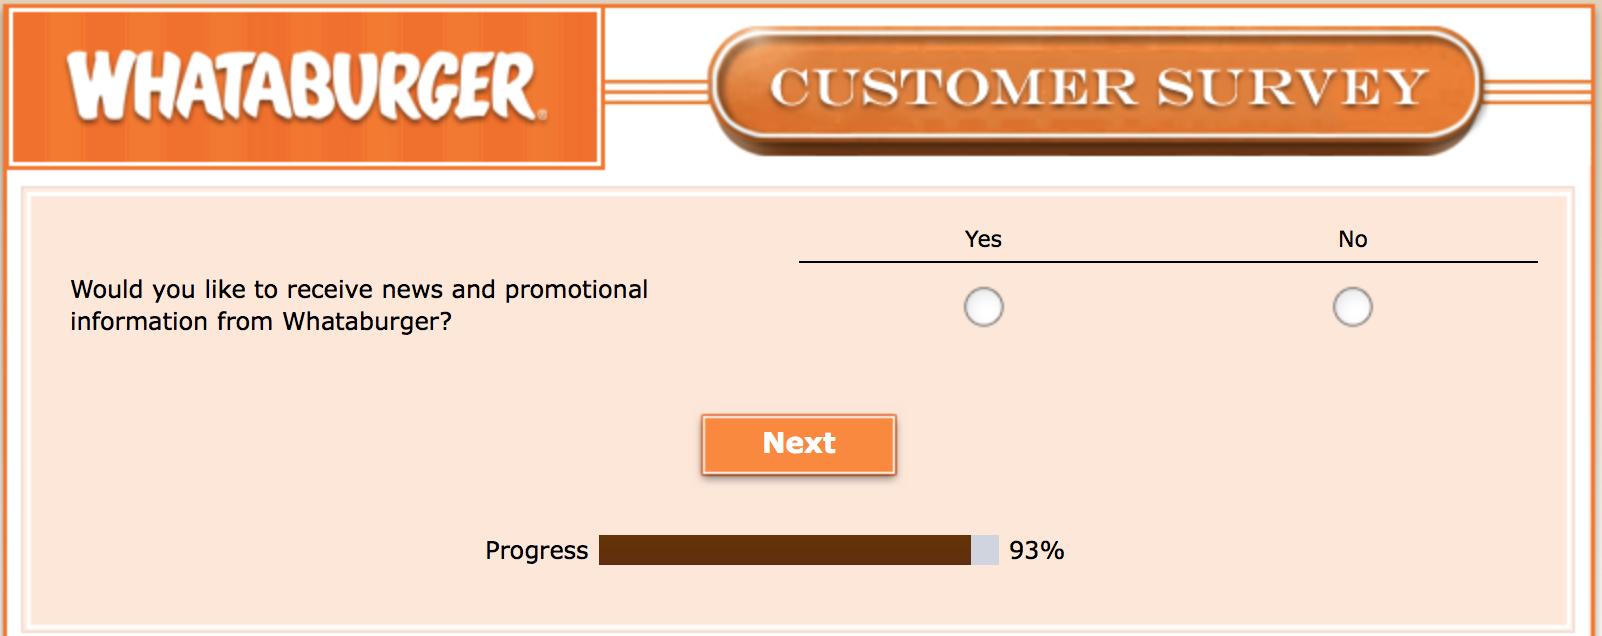 Whataburger Survey 32